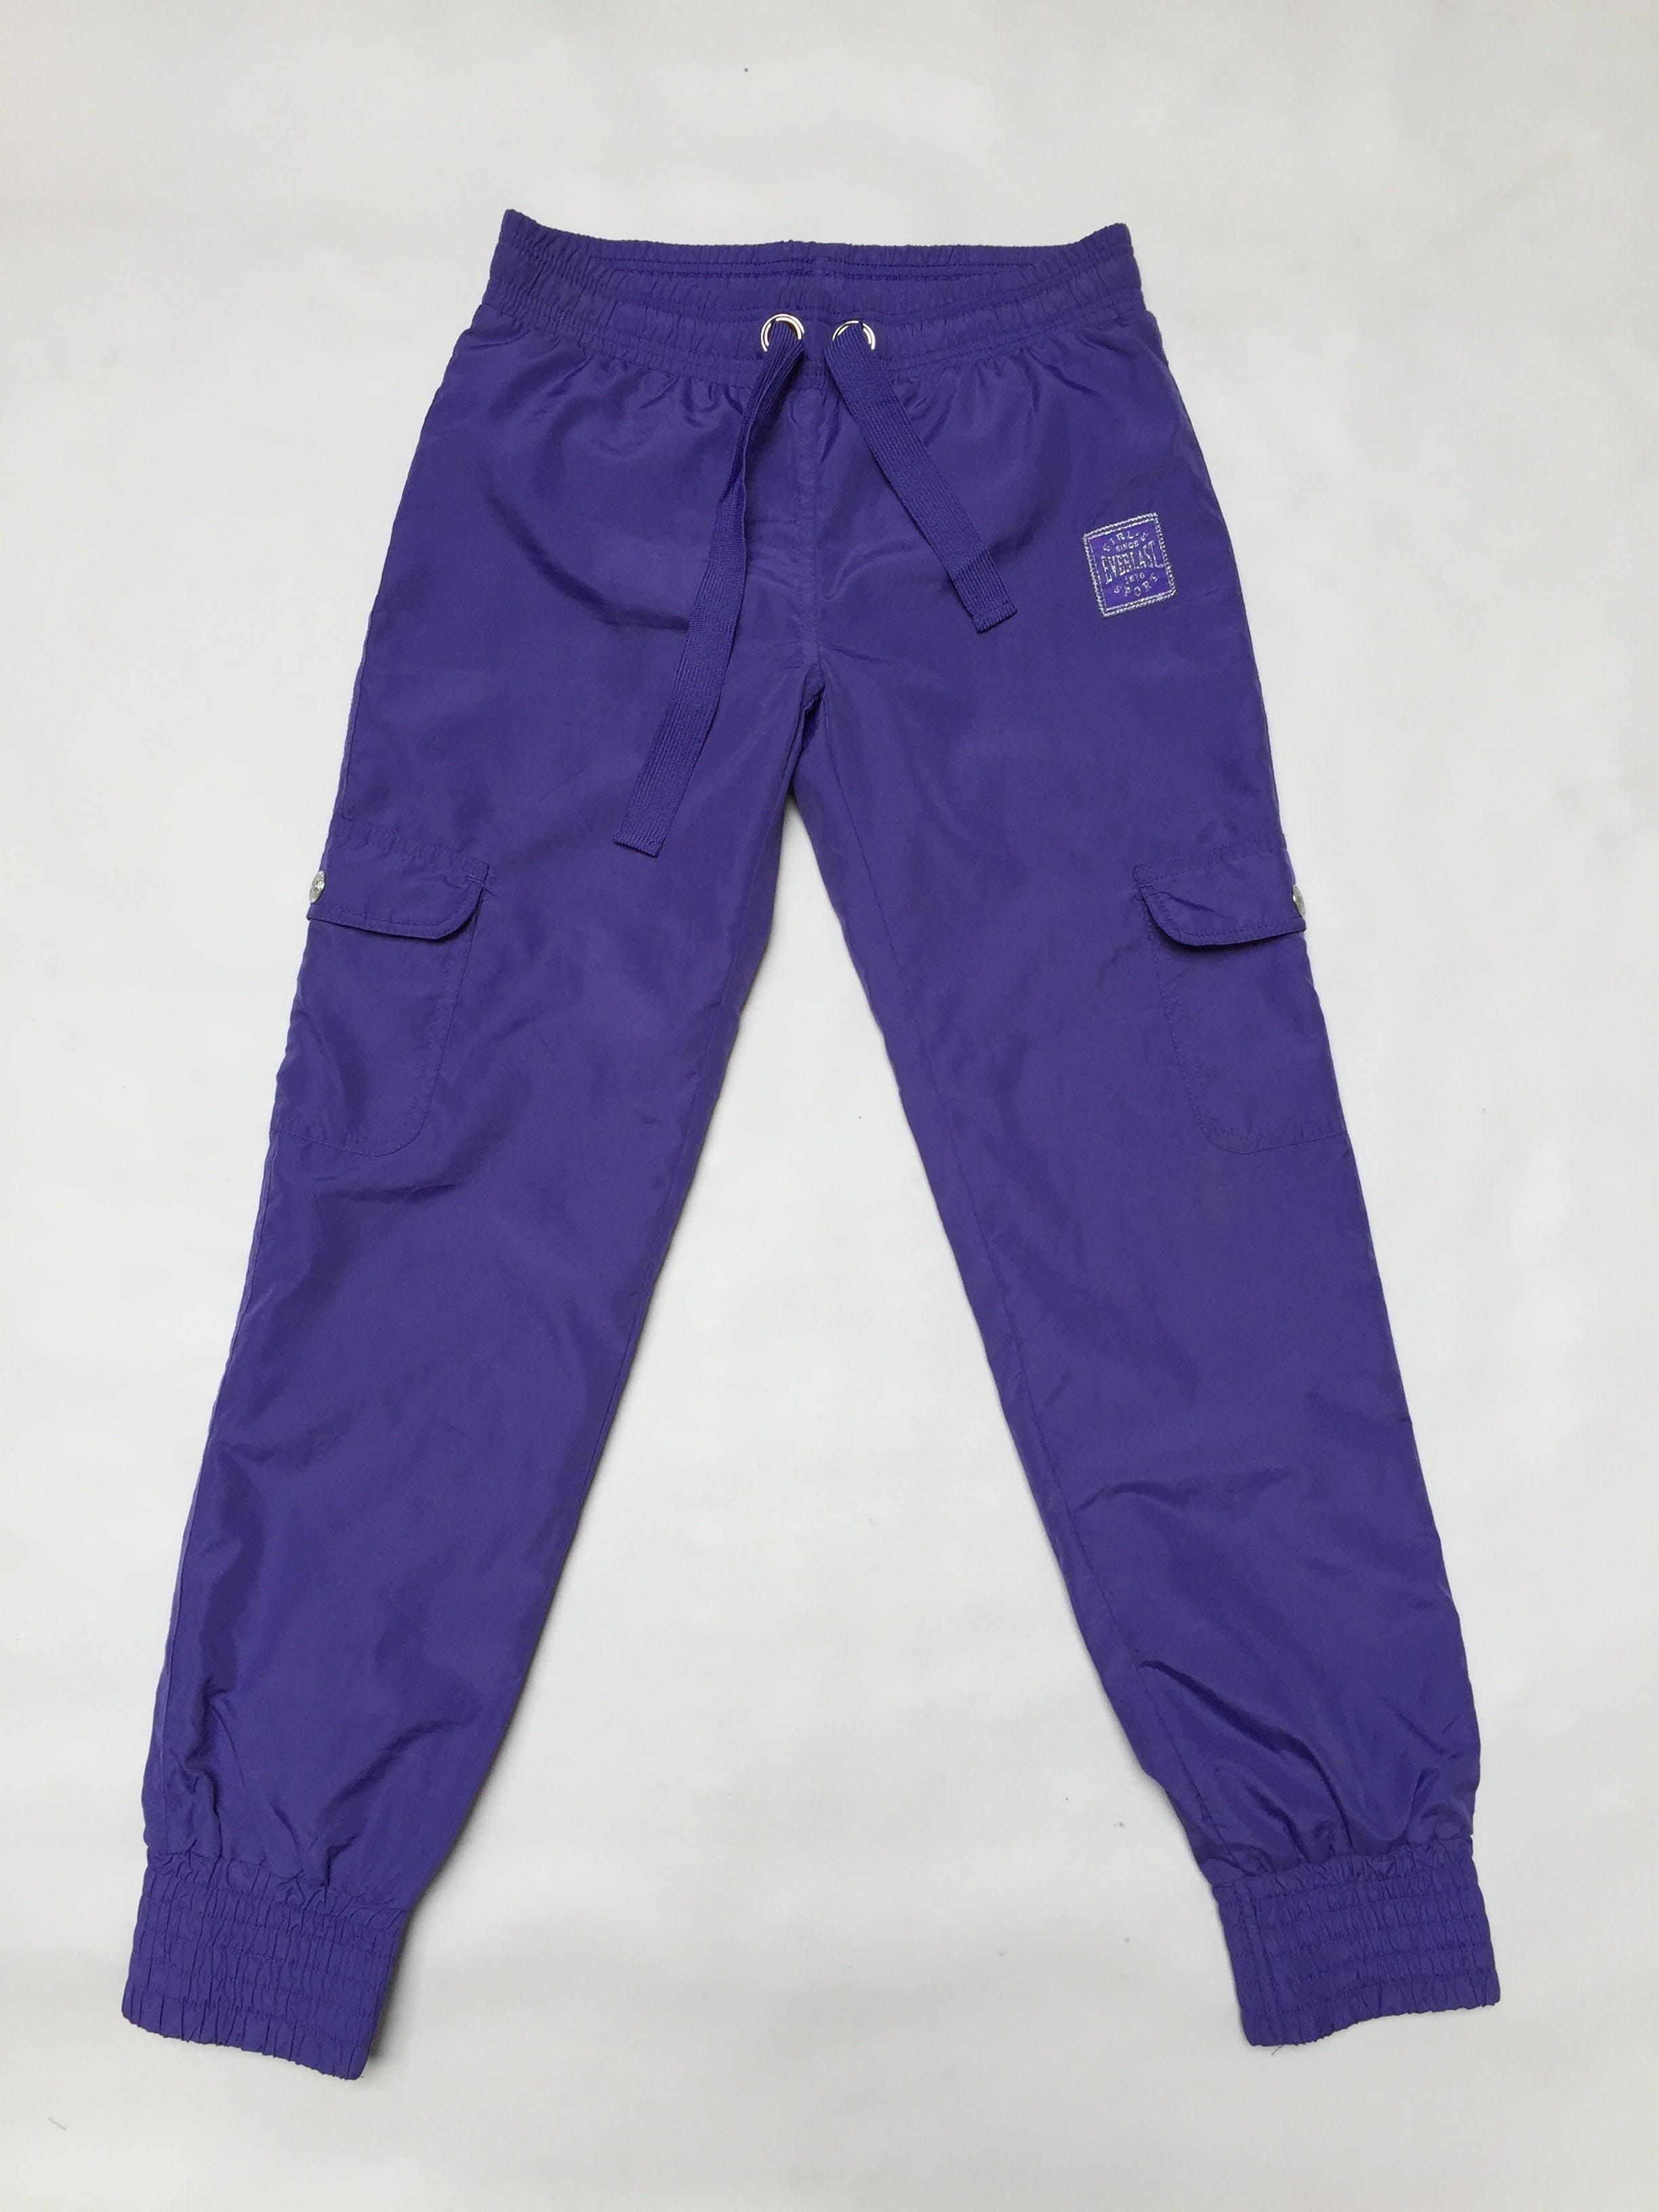 pantalon-Everlast-imagen